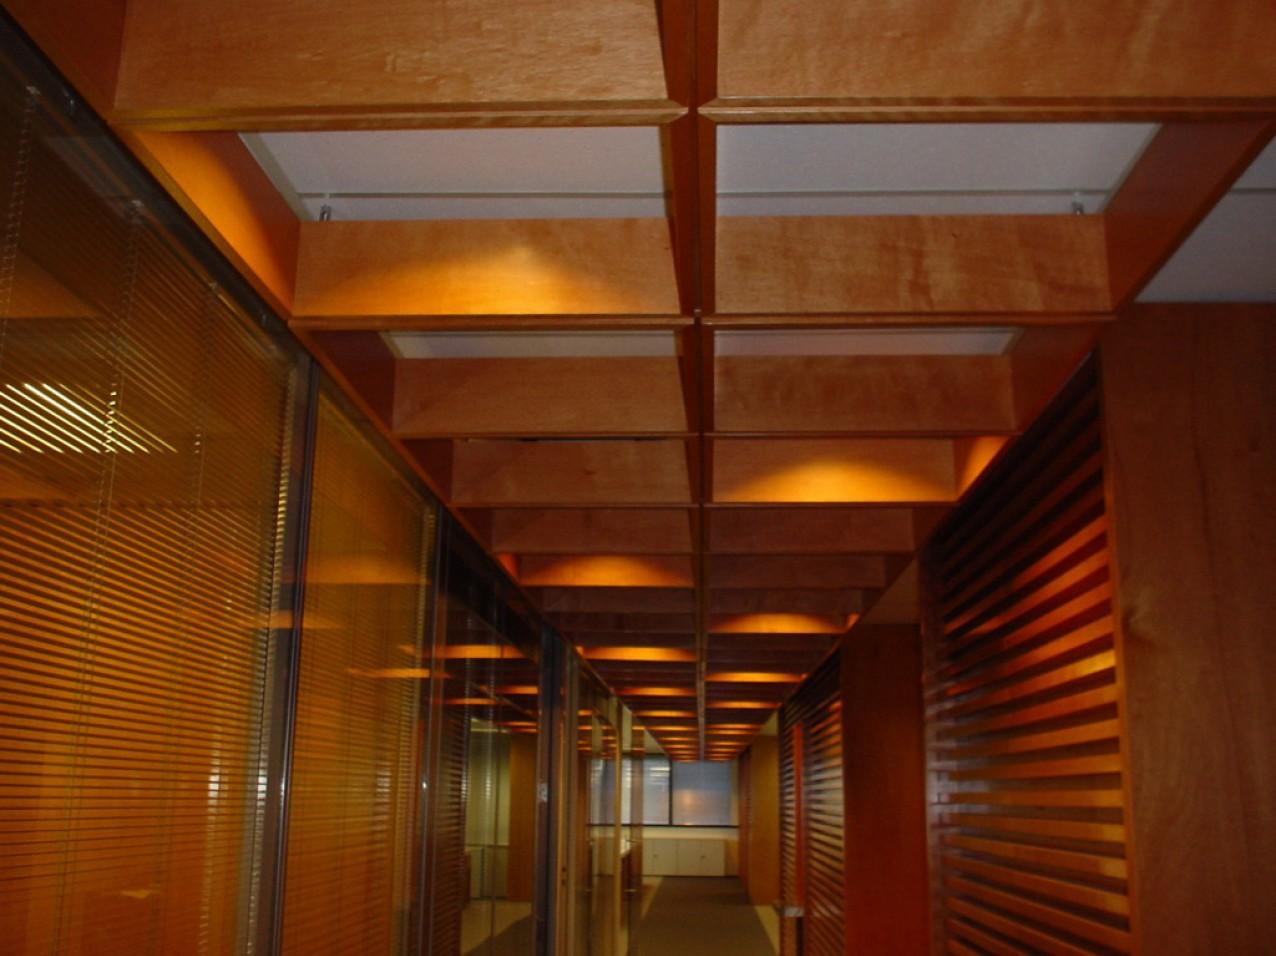 Obra corporativa Intercap - Iluminação